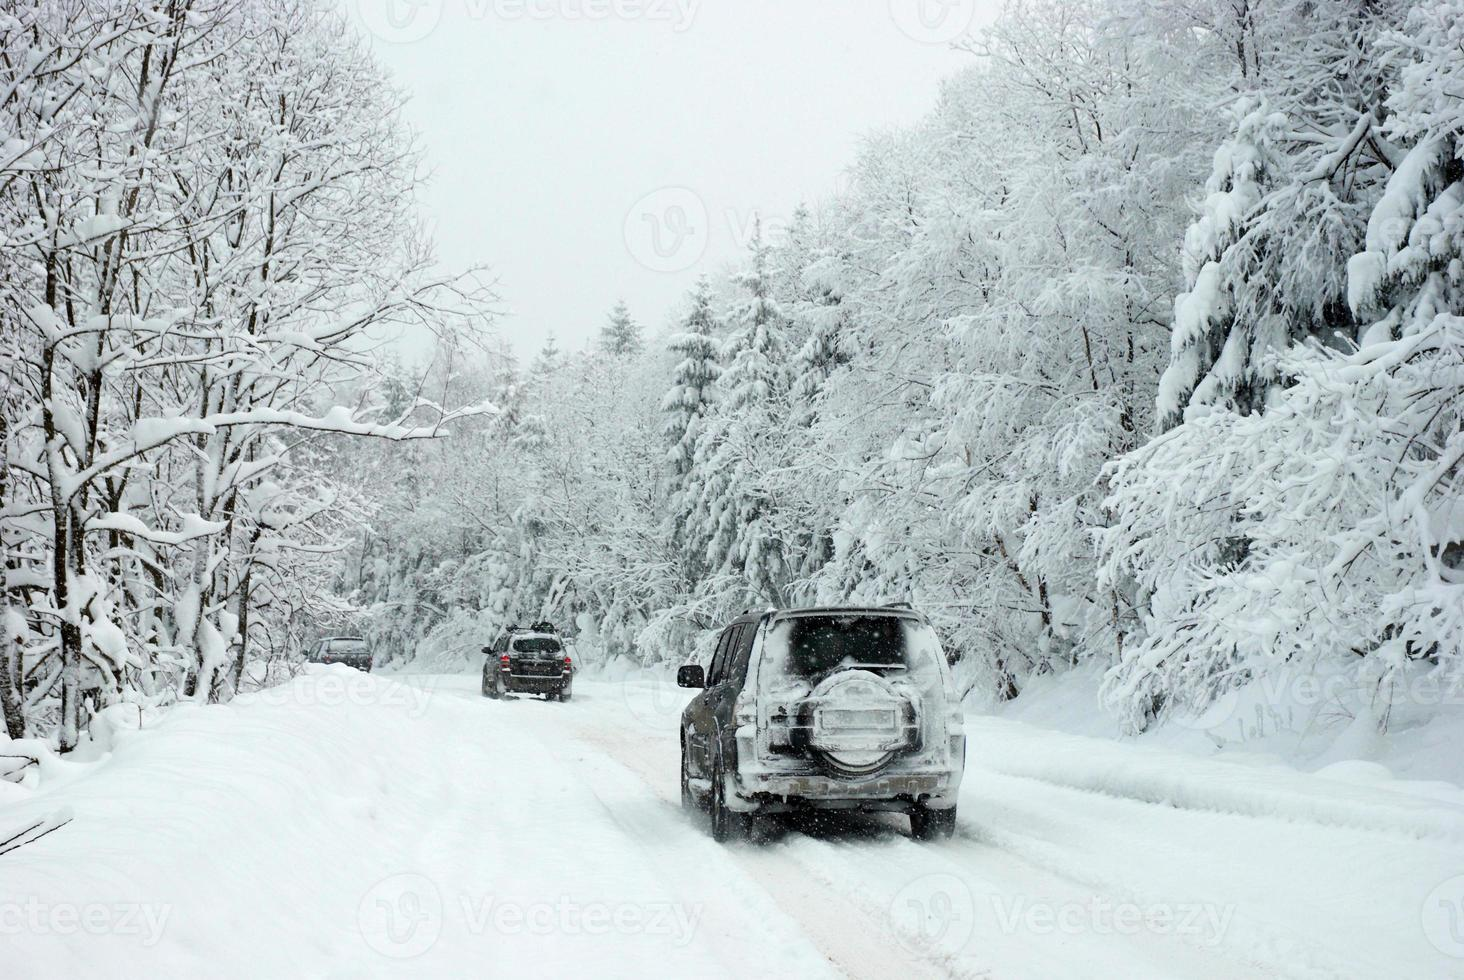 raduno invernale foto